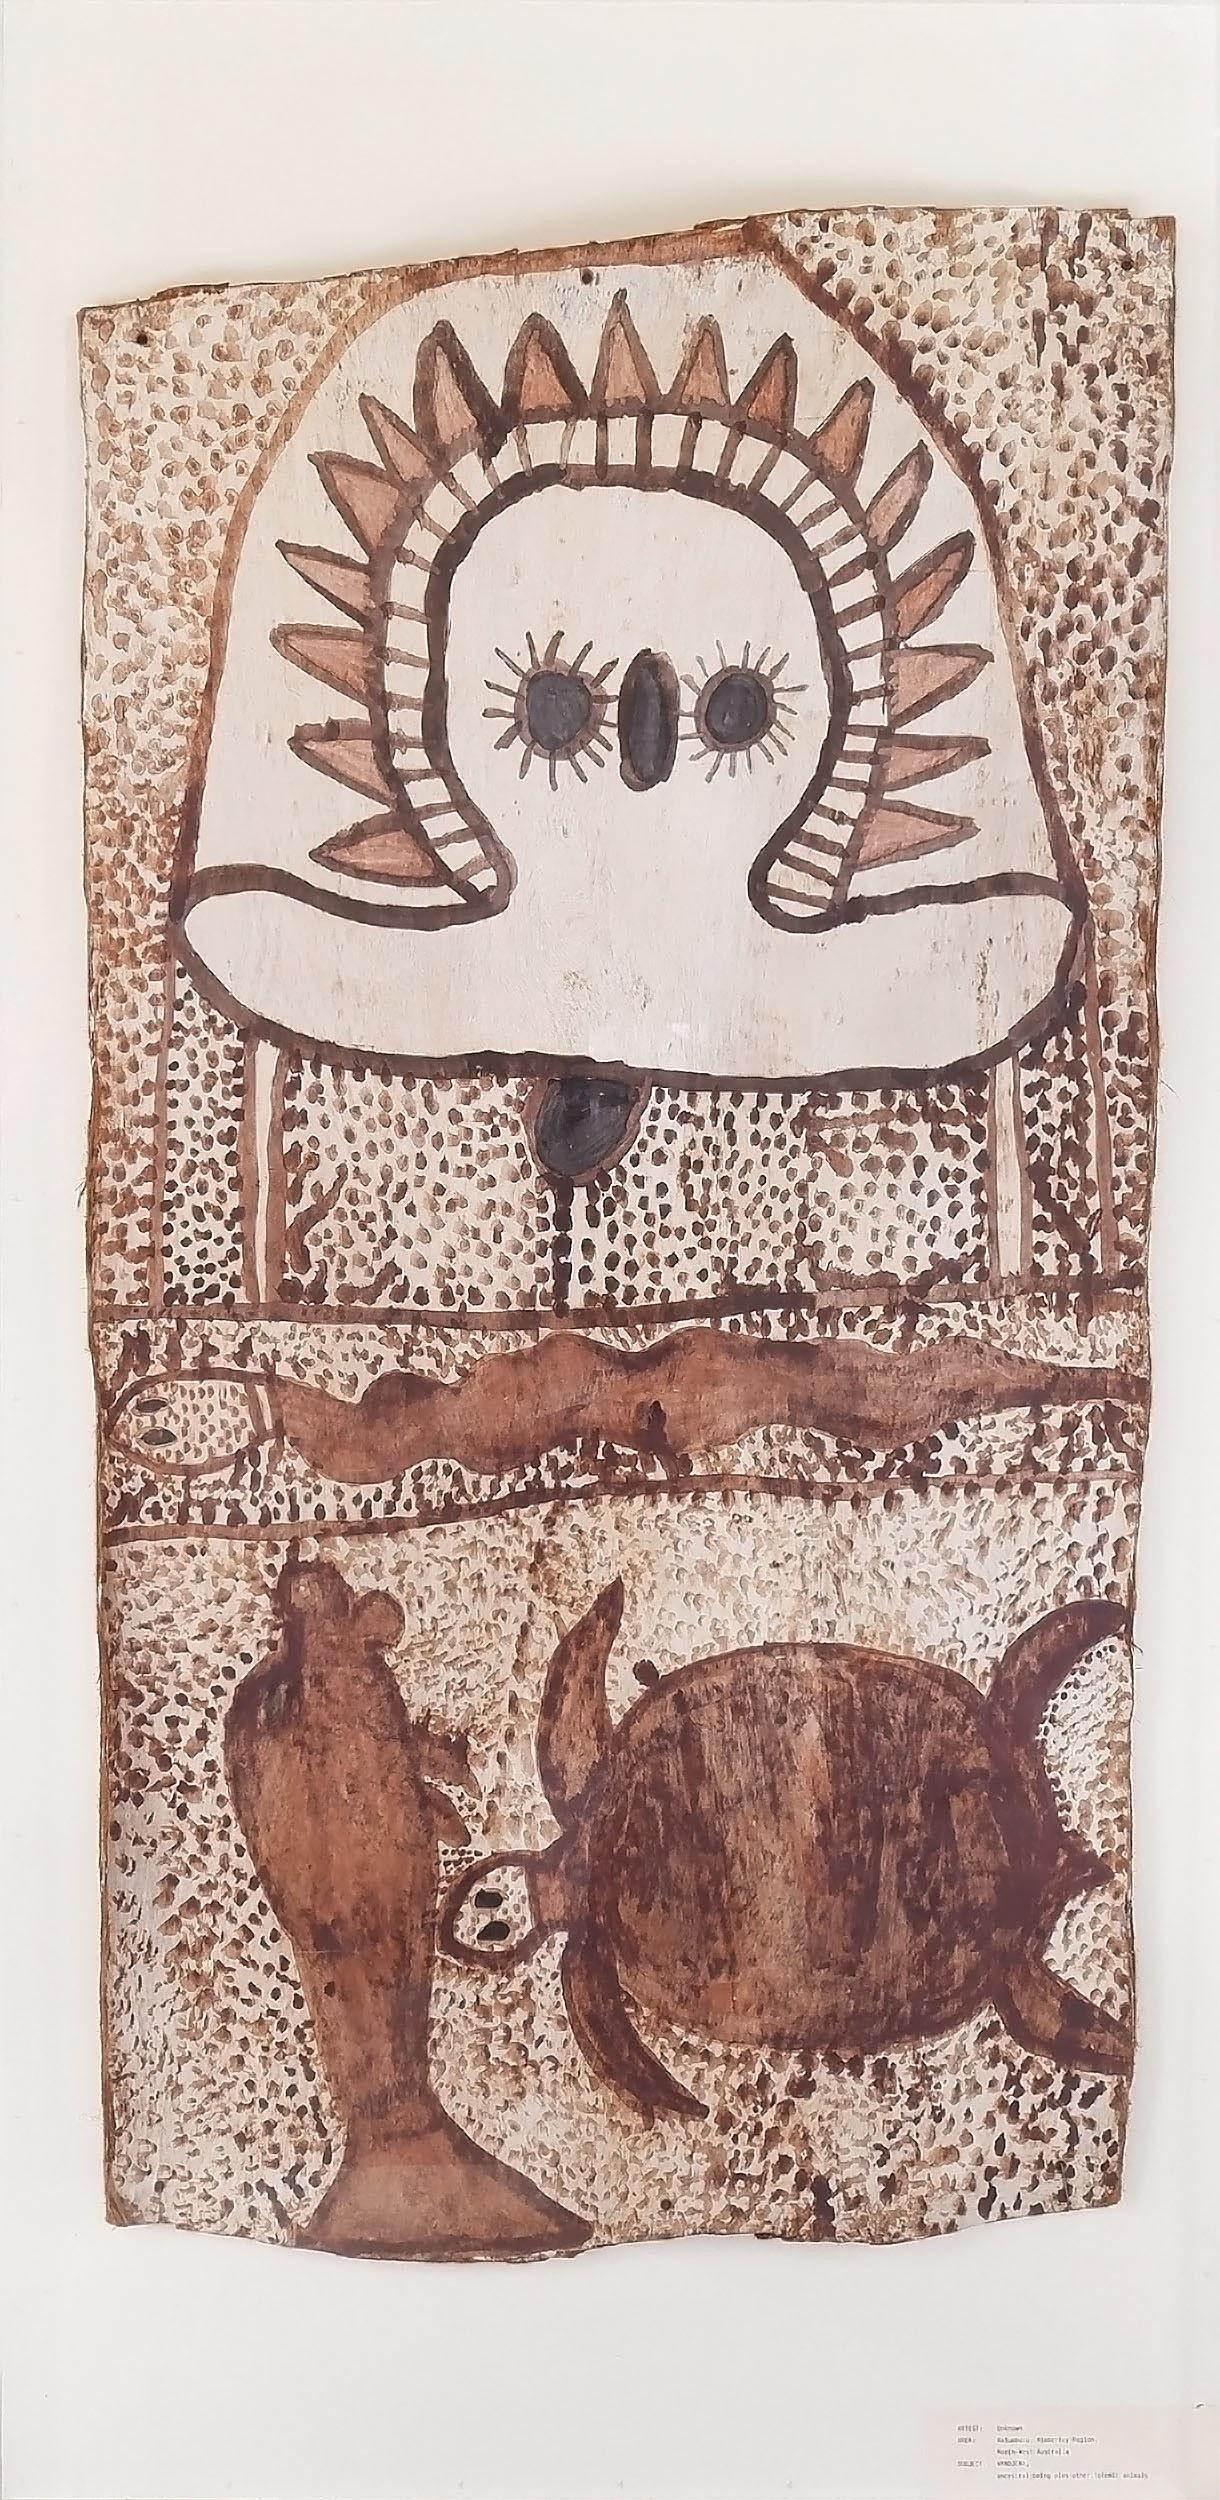 'Aboriginal Artist Unknown (Kimberley Region) Wandjina Spirit and Totemic Animals, Ochre on Bark'